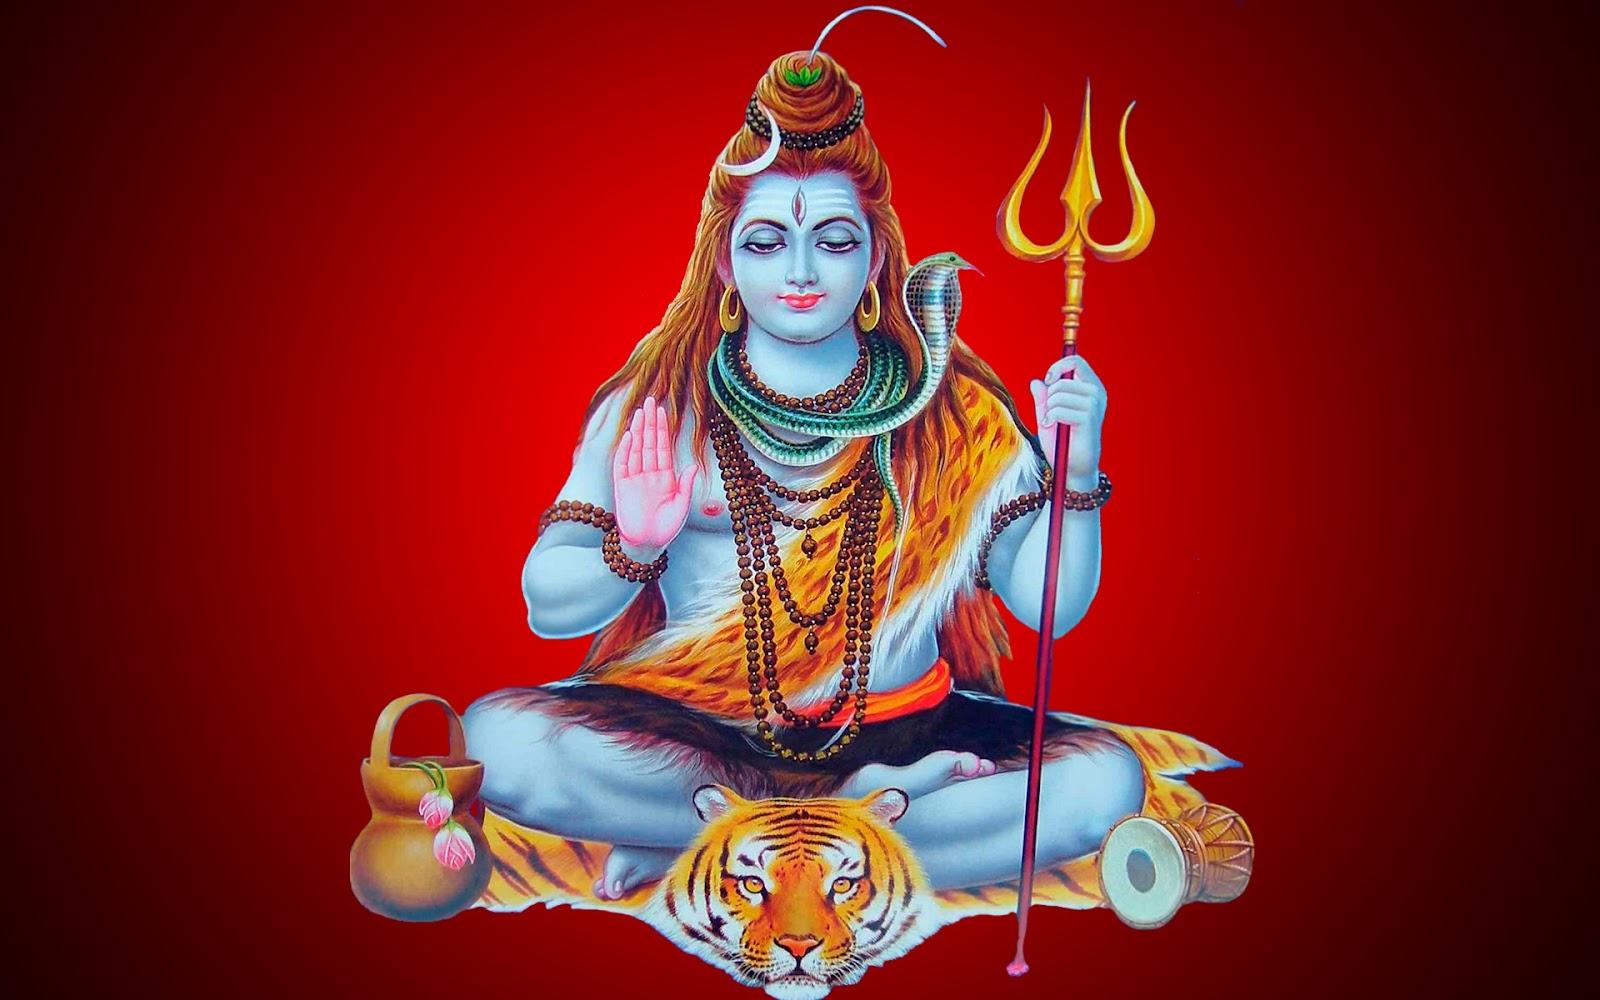 Shiva Wallpaper For Desktop: Lord Shiva Wallpaper And Beautiful Images